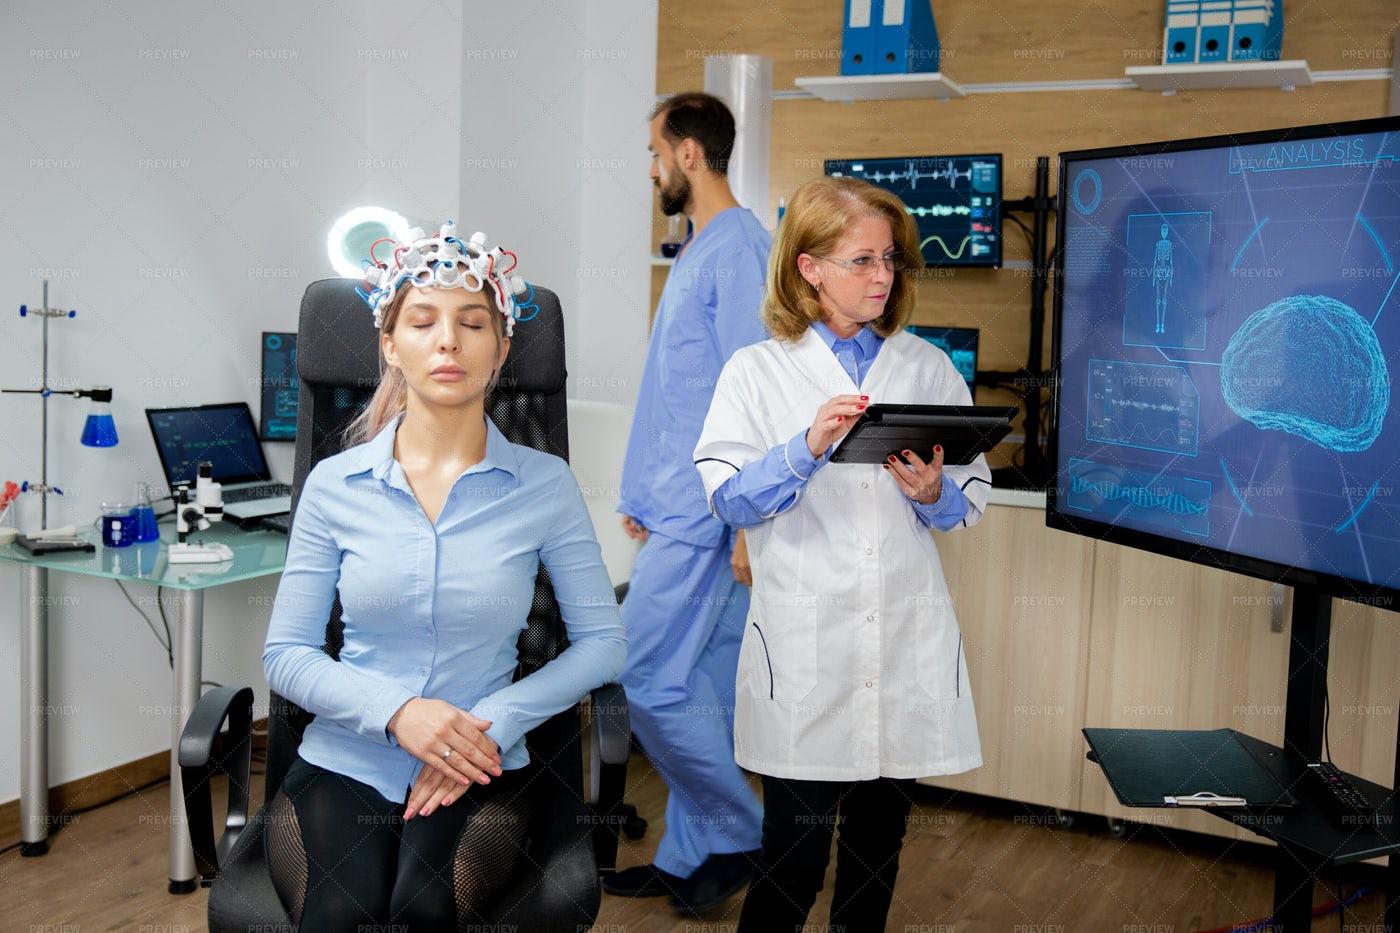 Doctor Procedure Of A Brain Scan: Stock Photos